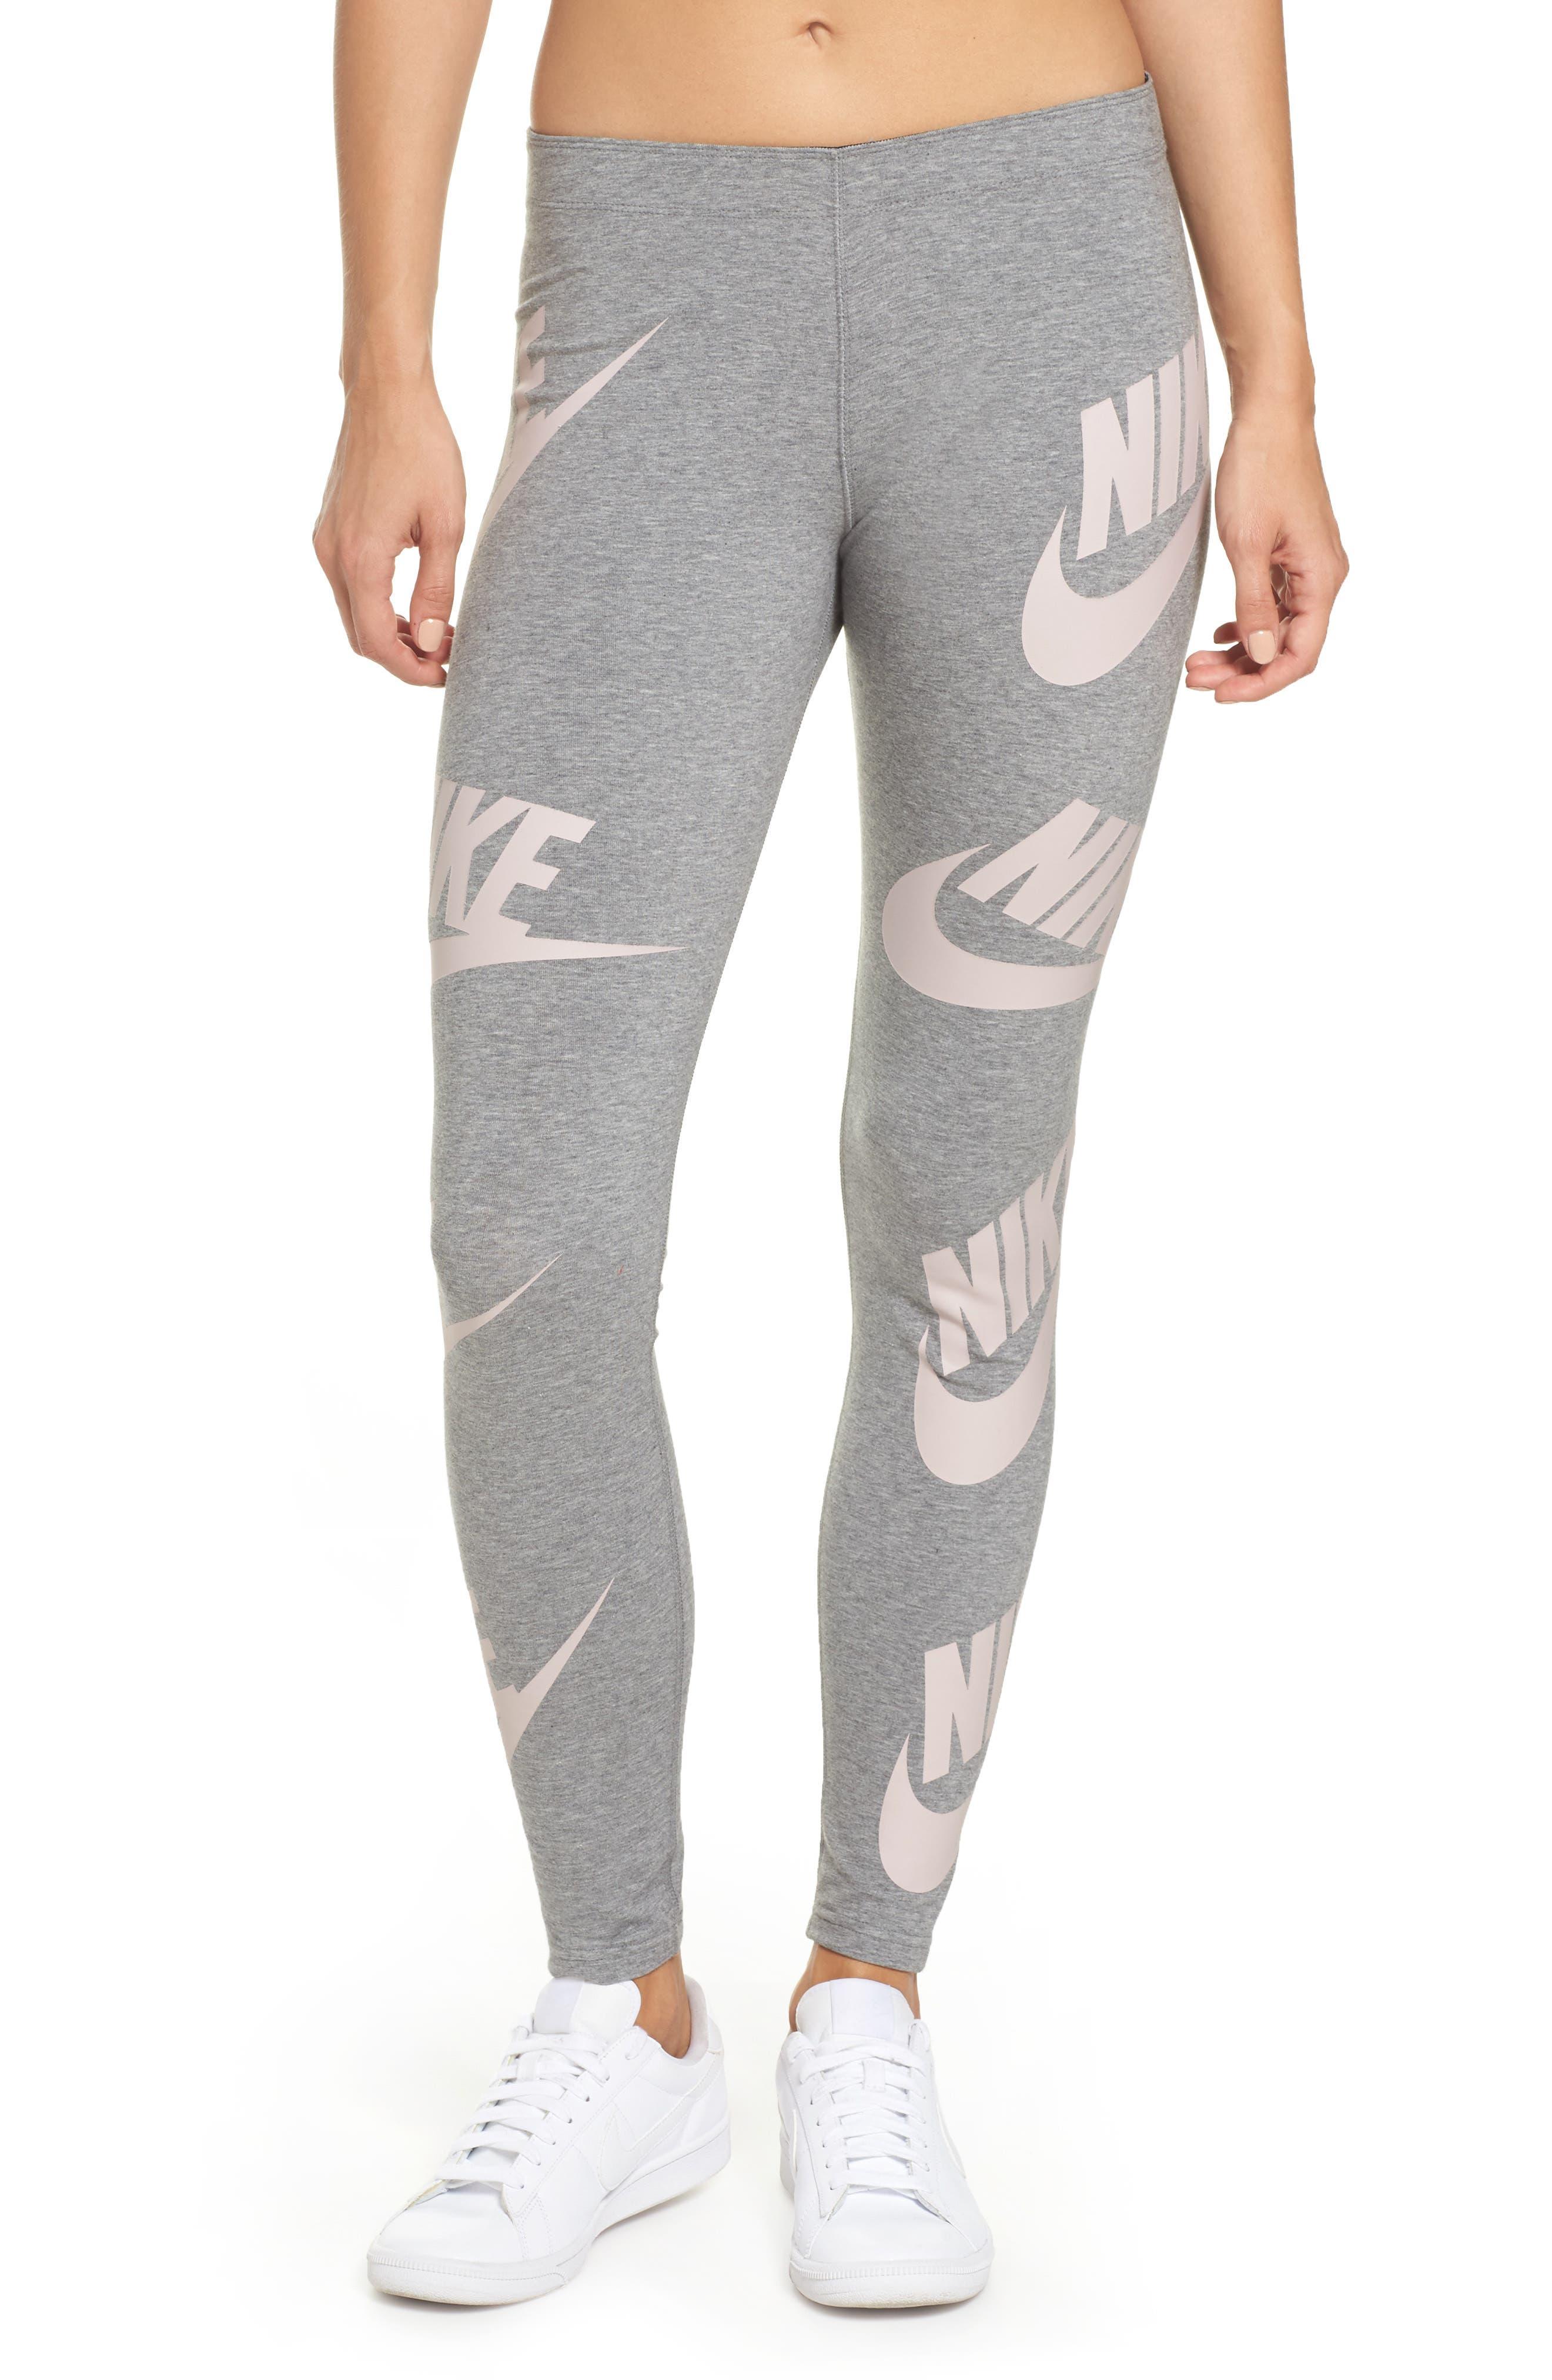 32cc45f192035 ... Nike Women S Sportswear Futura Leg A See Leggings, Grey In Carbon  Heather Elemental Rose ...